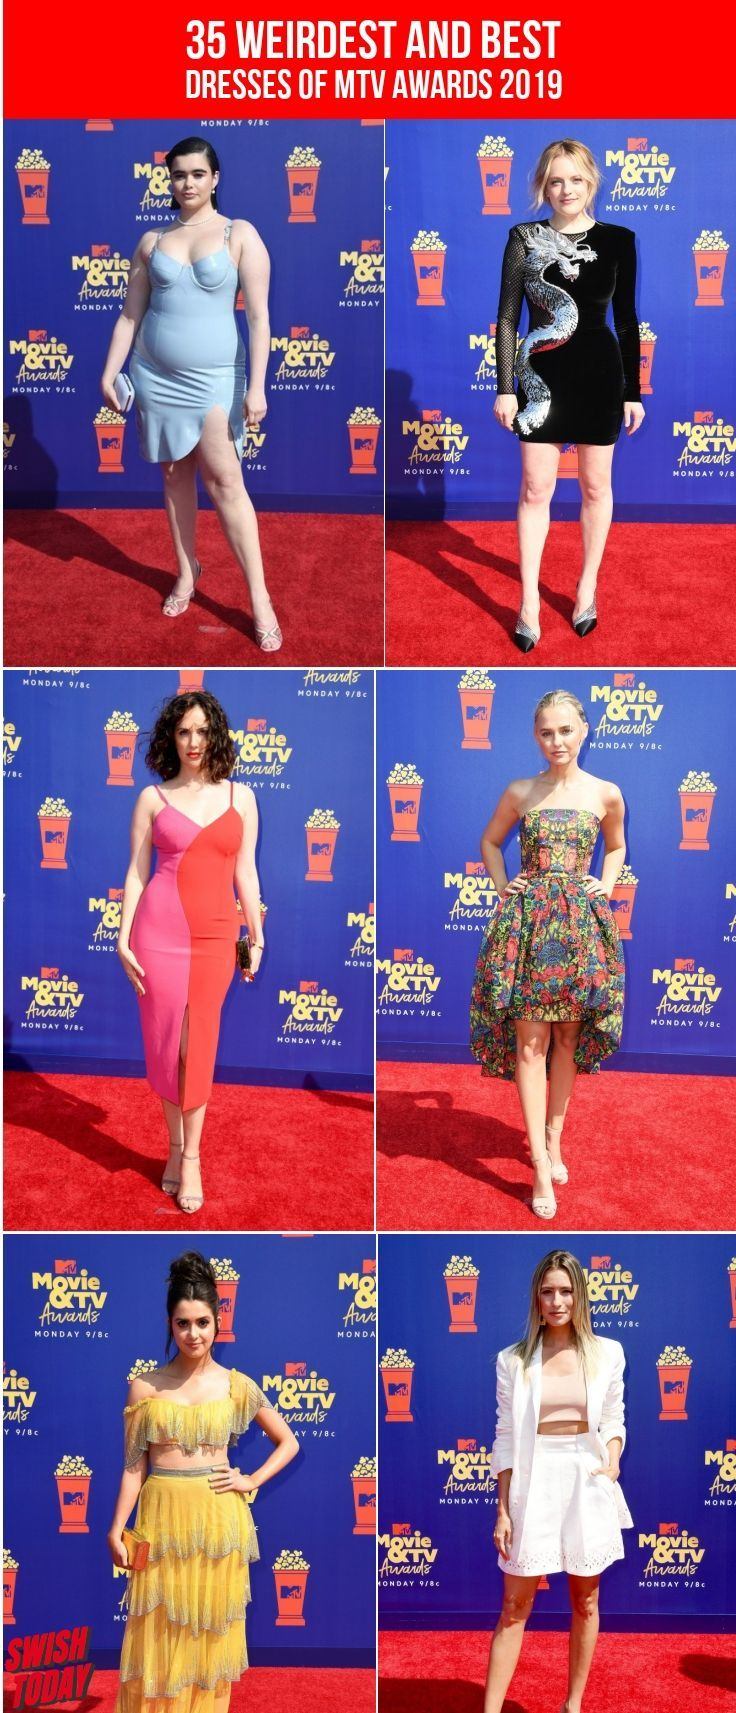 35 Weirdest And Best Dresses Of MTV Awards 2019 Mtv